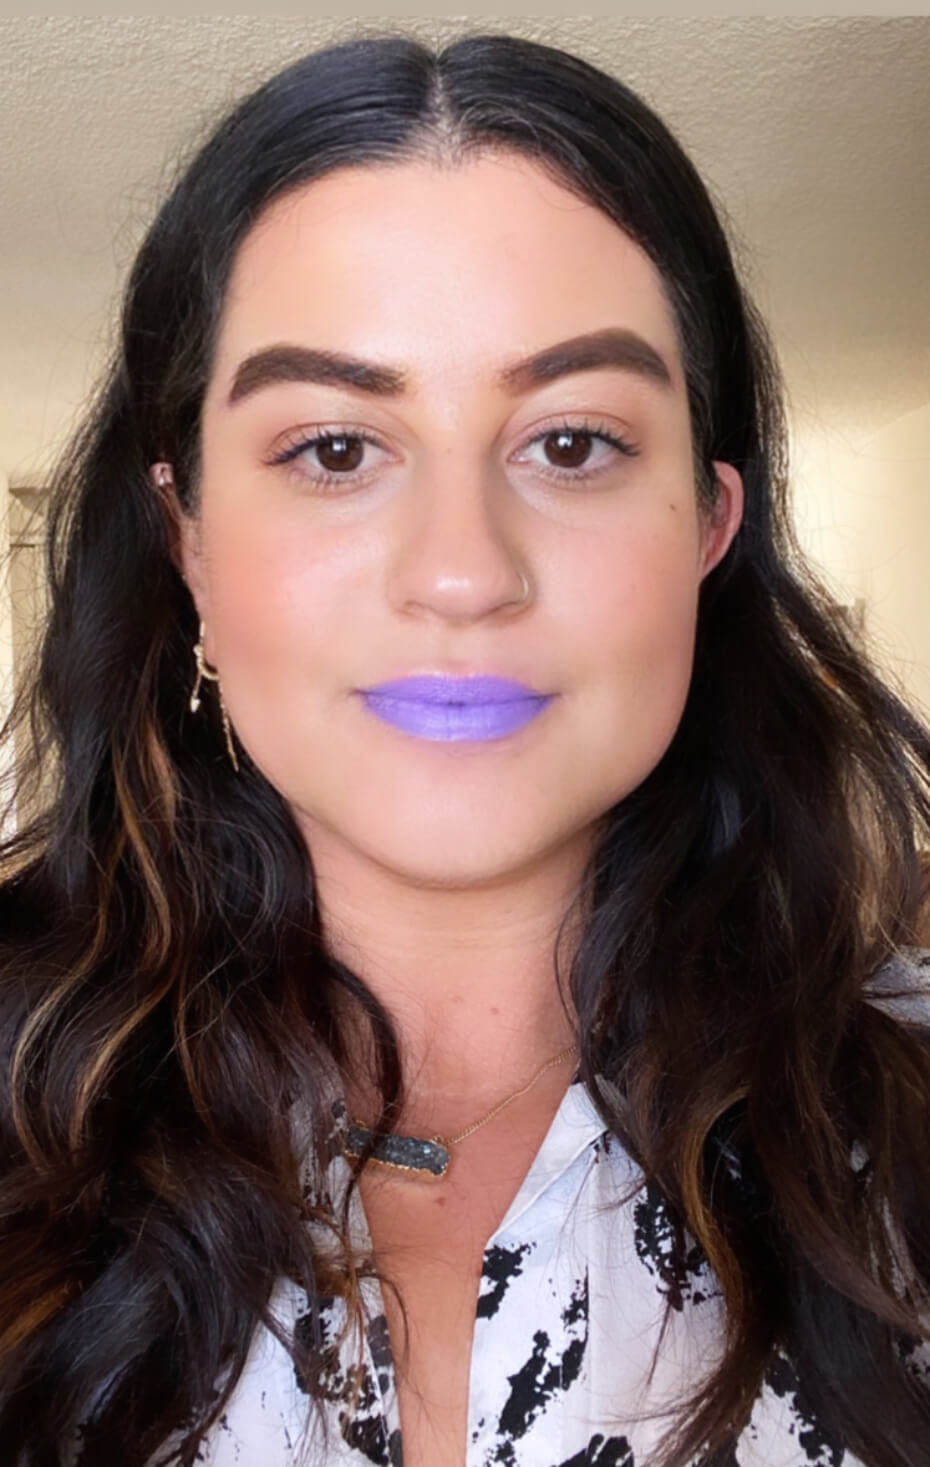 lipstick-nyx-wisteria-lilas-072920-1